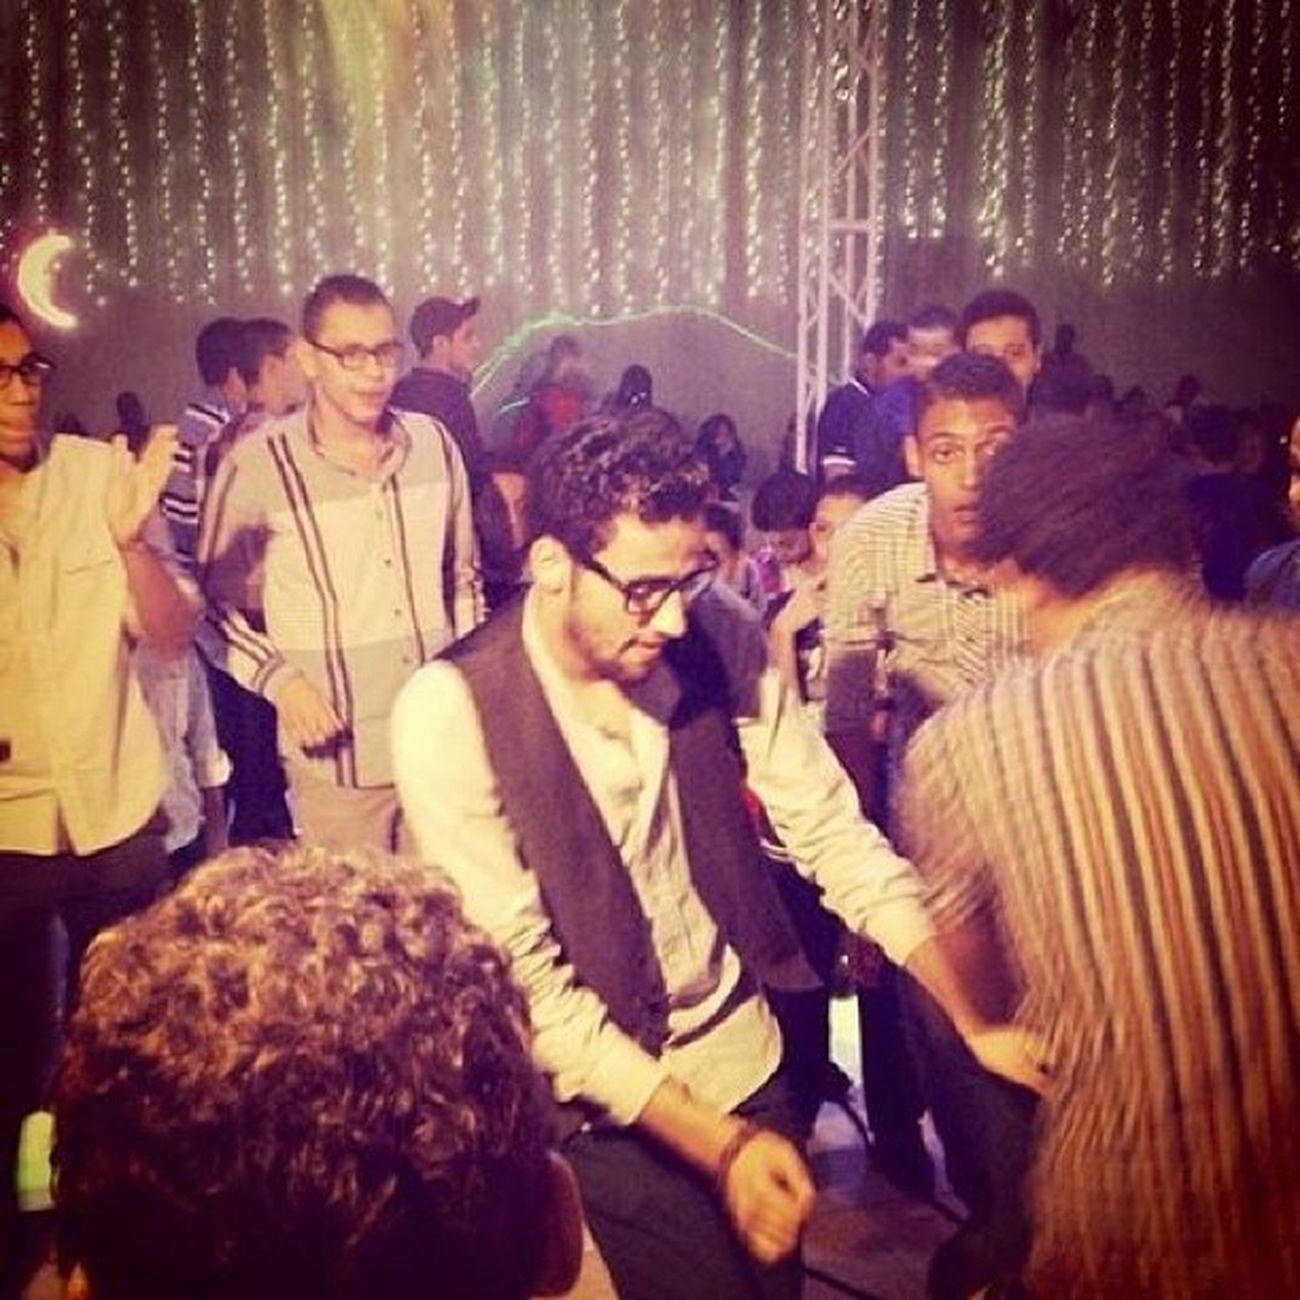 Gohar Timberlake  Justin Abdllah Essa Shot Wedding Y3ny Fra7 Hhhhh